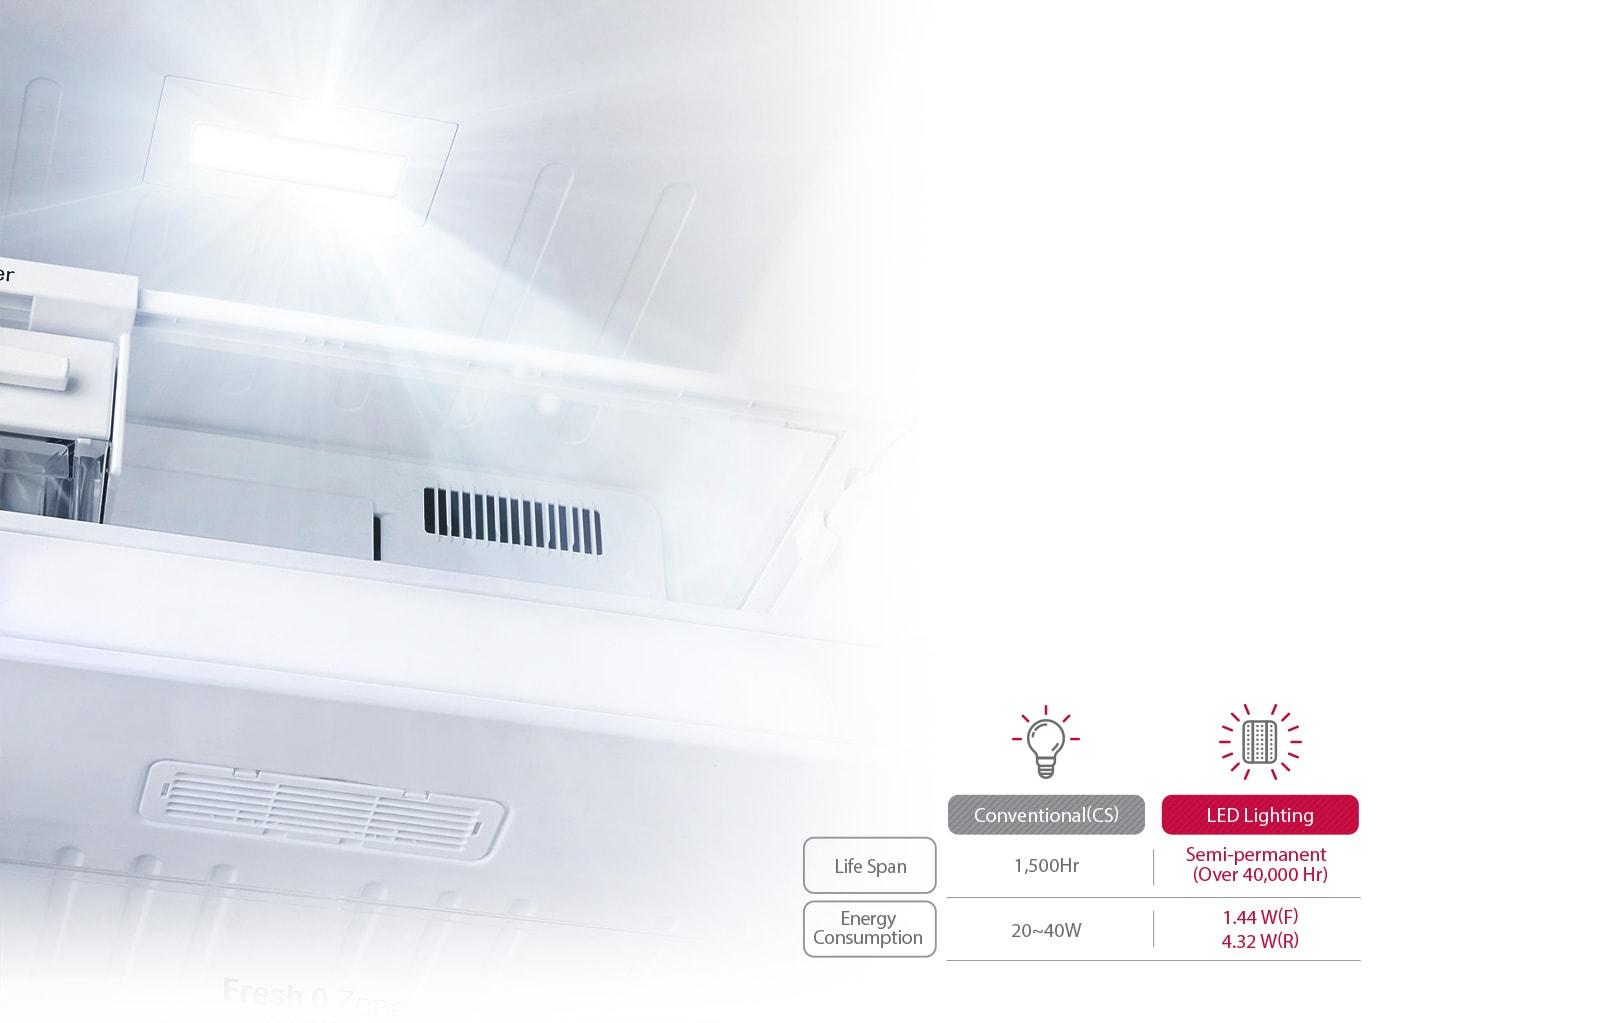 LG GL-T372JPZN 335 Ltr LED Lighting